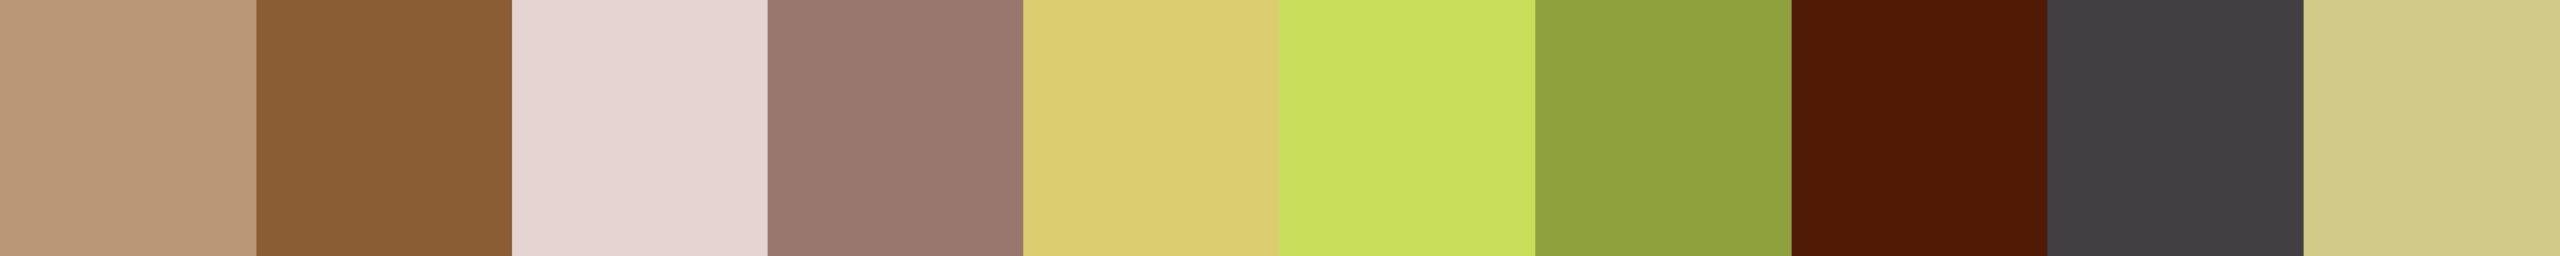 623 Jegroloti Color Palette